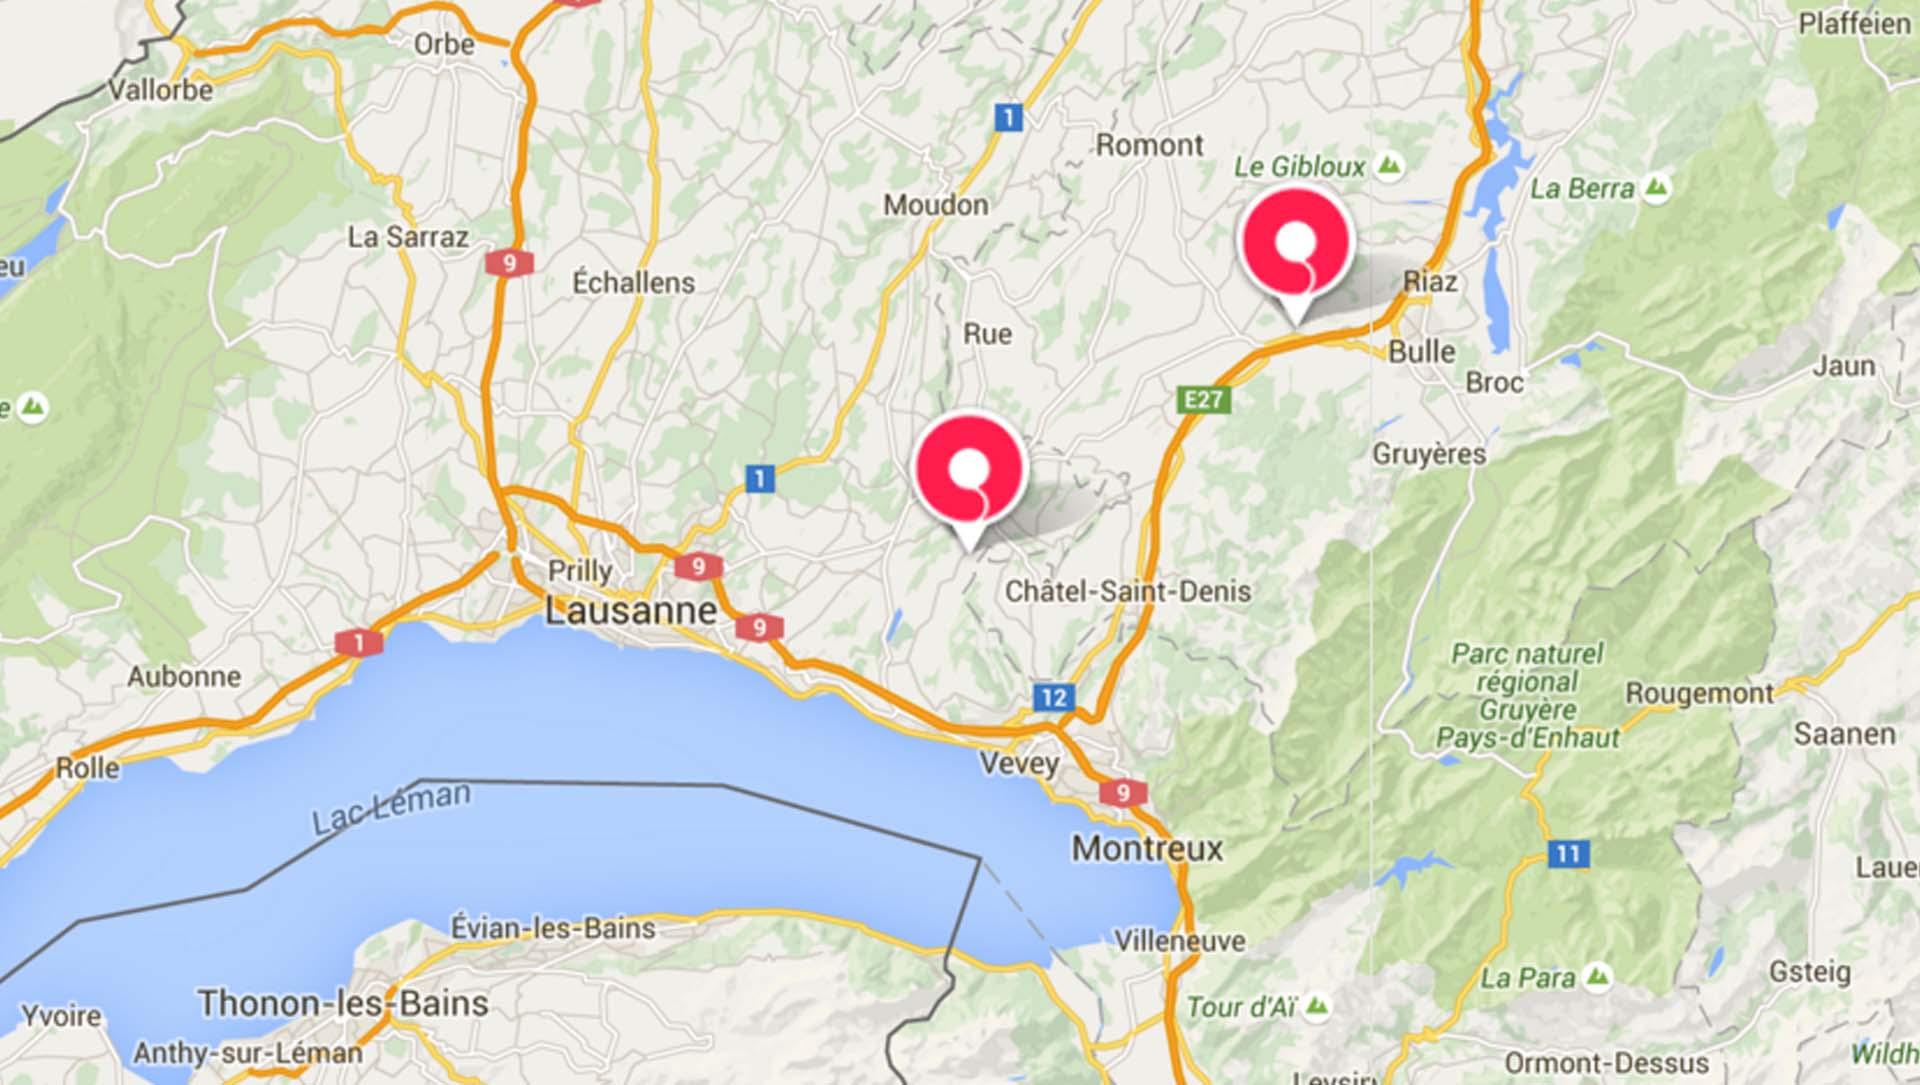 Stockage Vaud et Fribourg